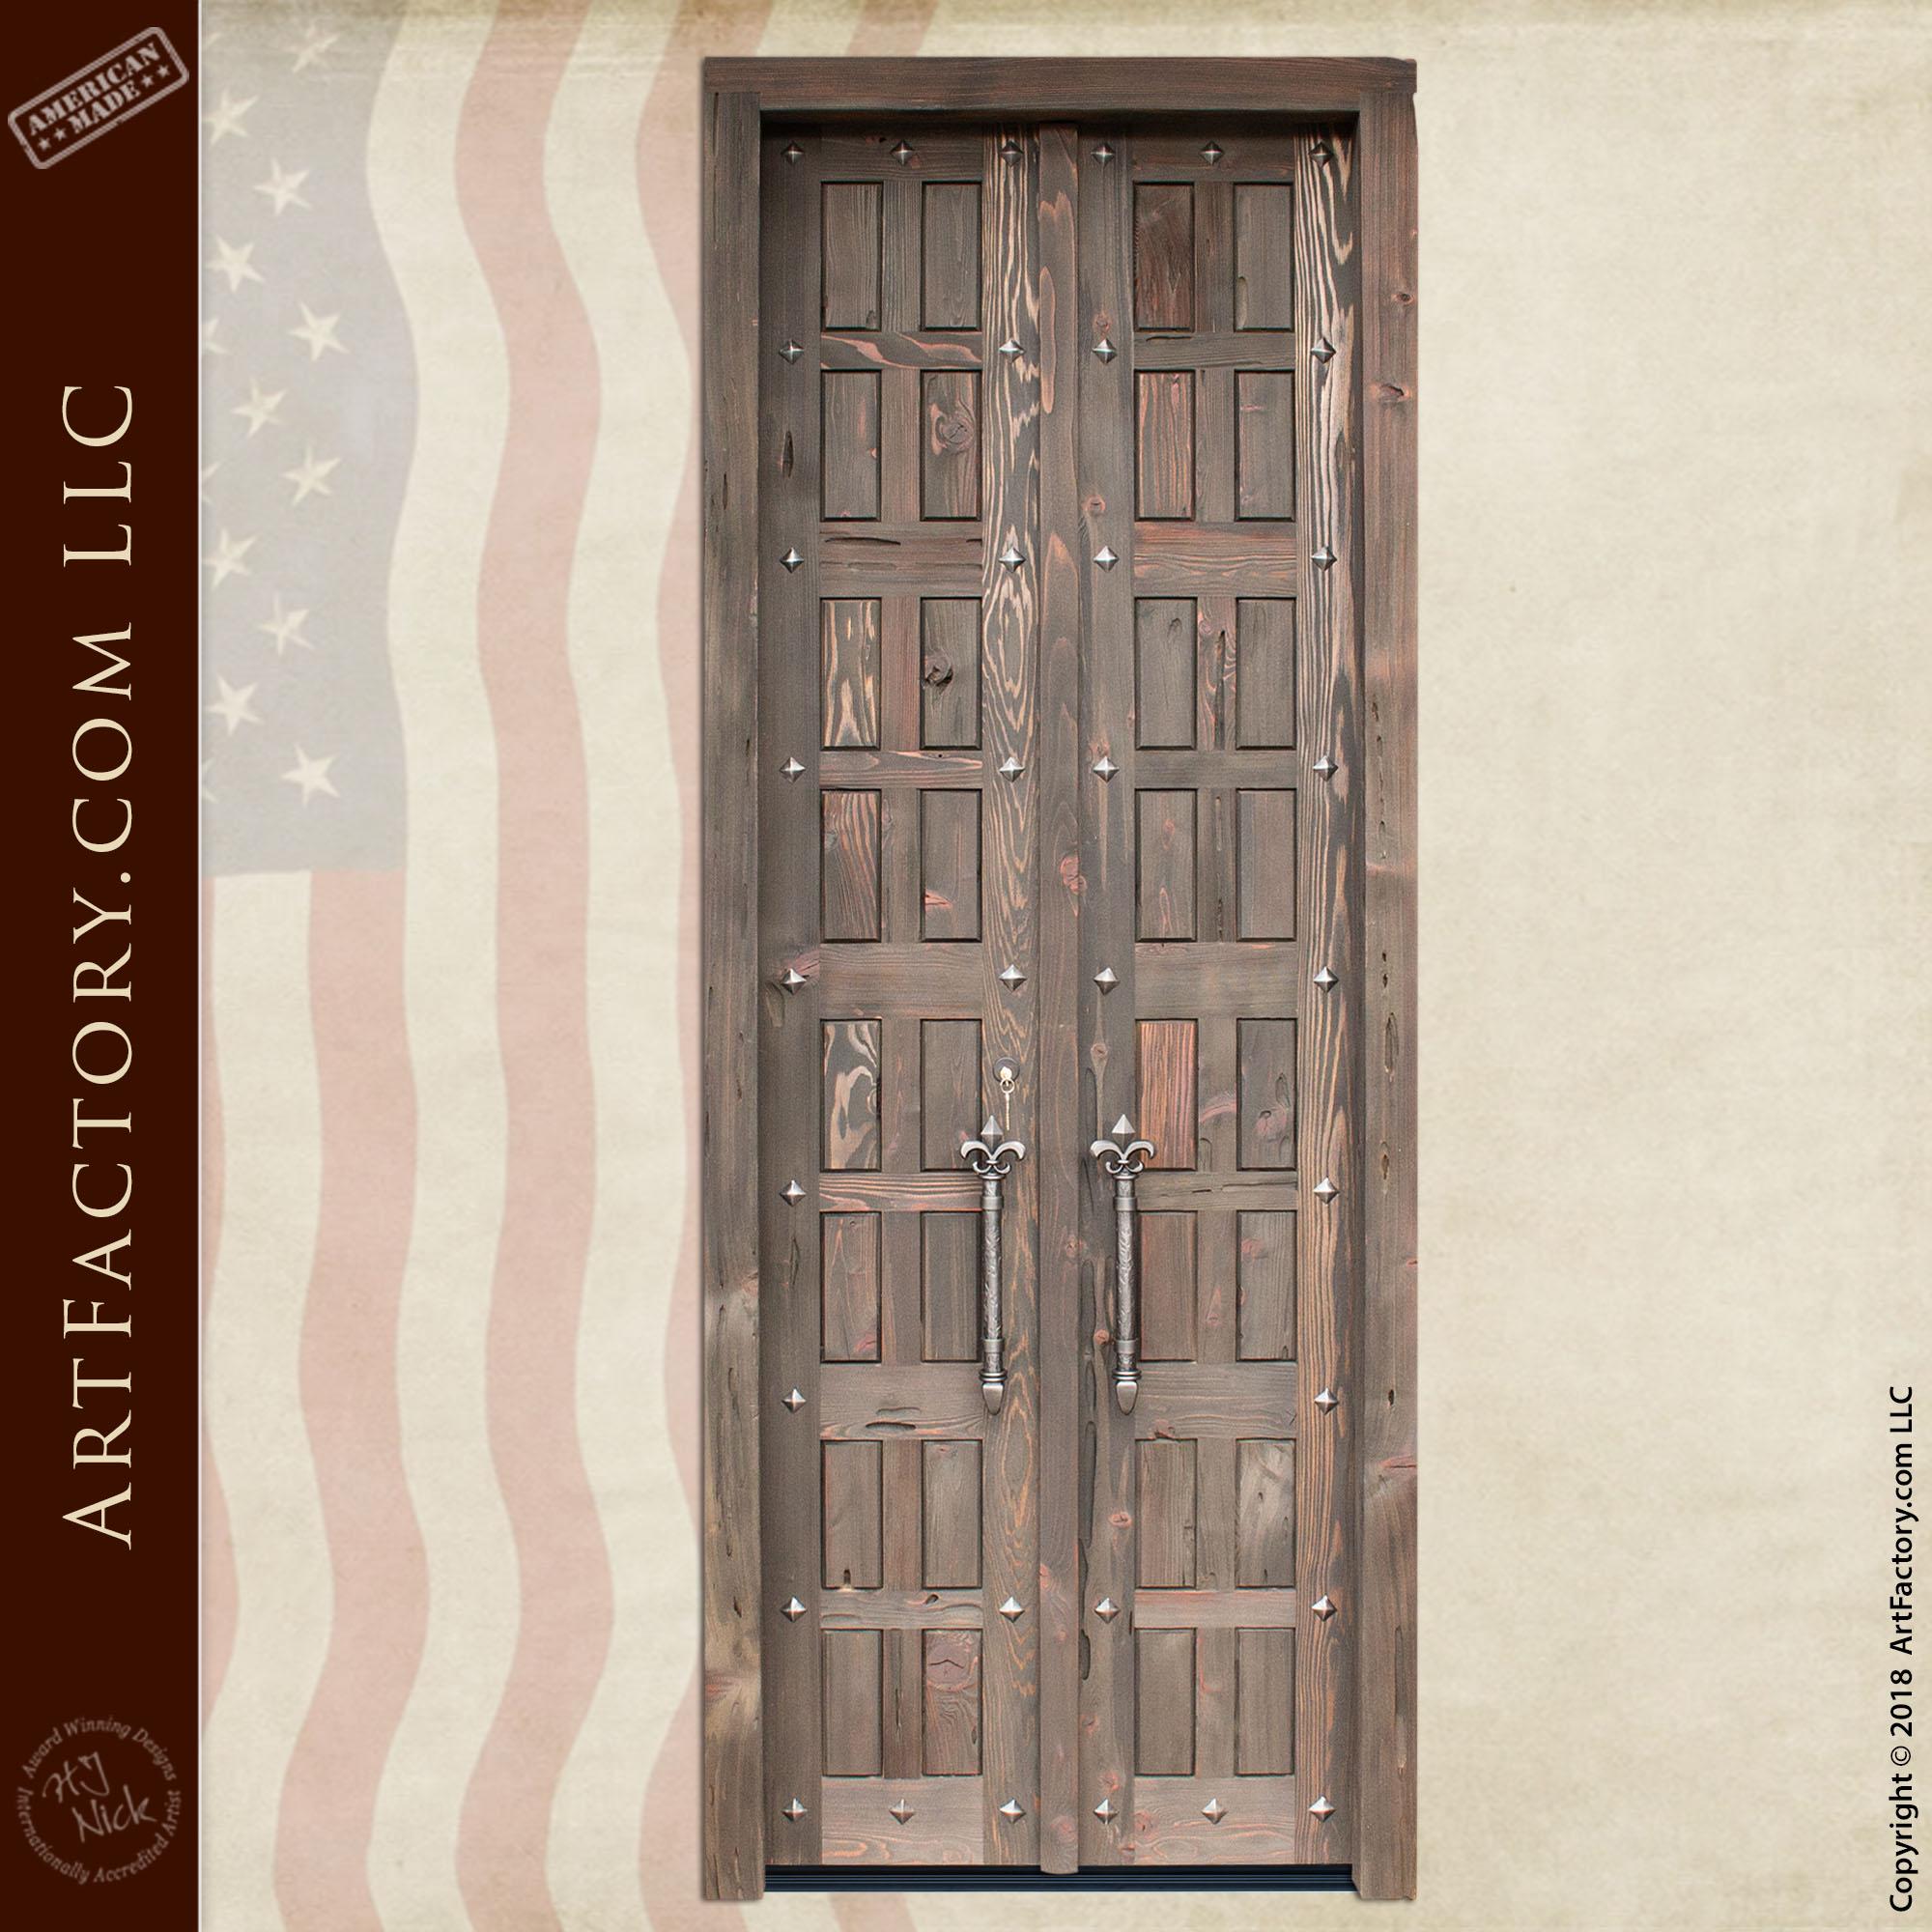 Gothic Style Double Doors with Fleur de Lis Pulls